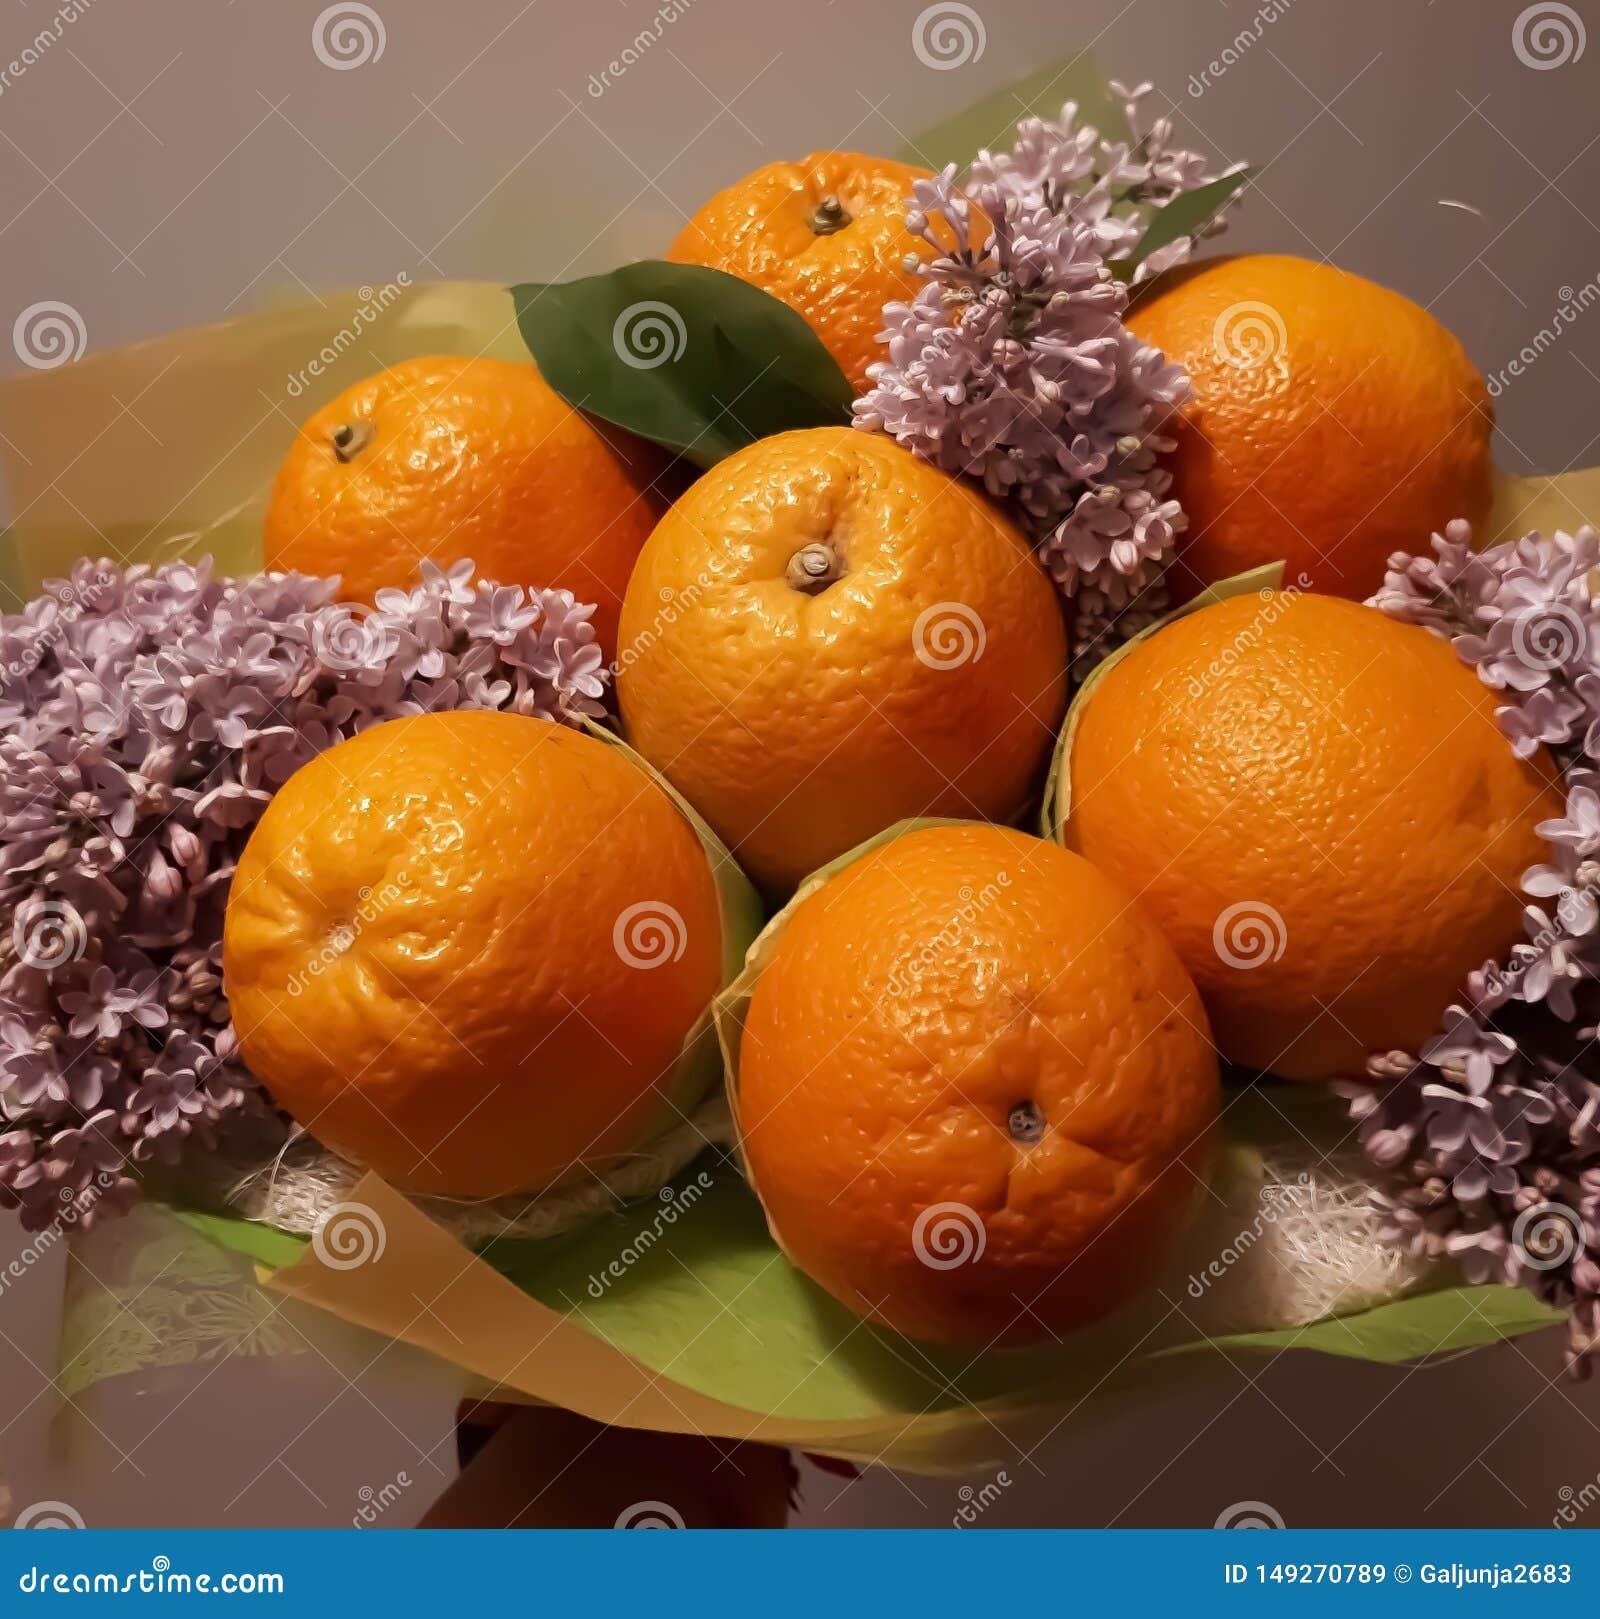 Ramalhete, fruto, flores, bonito, brilhante, coloridas